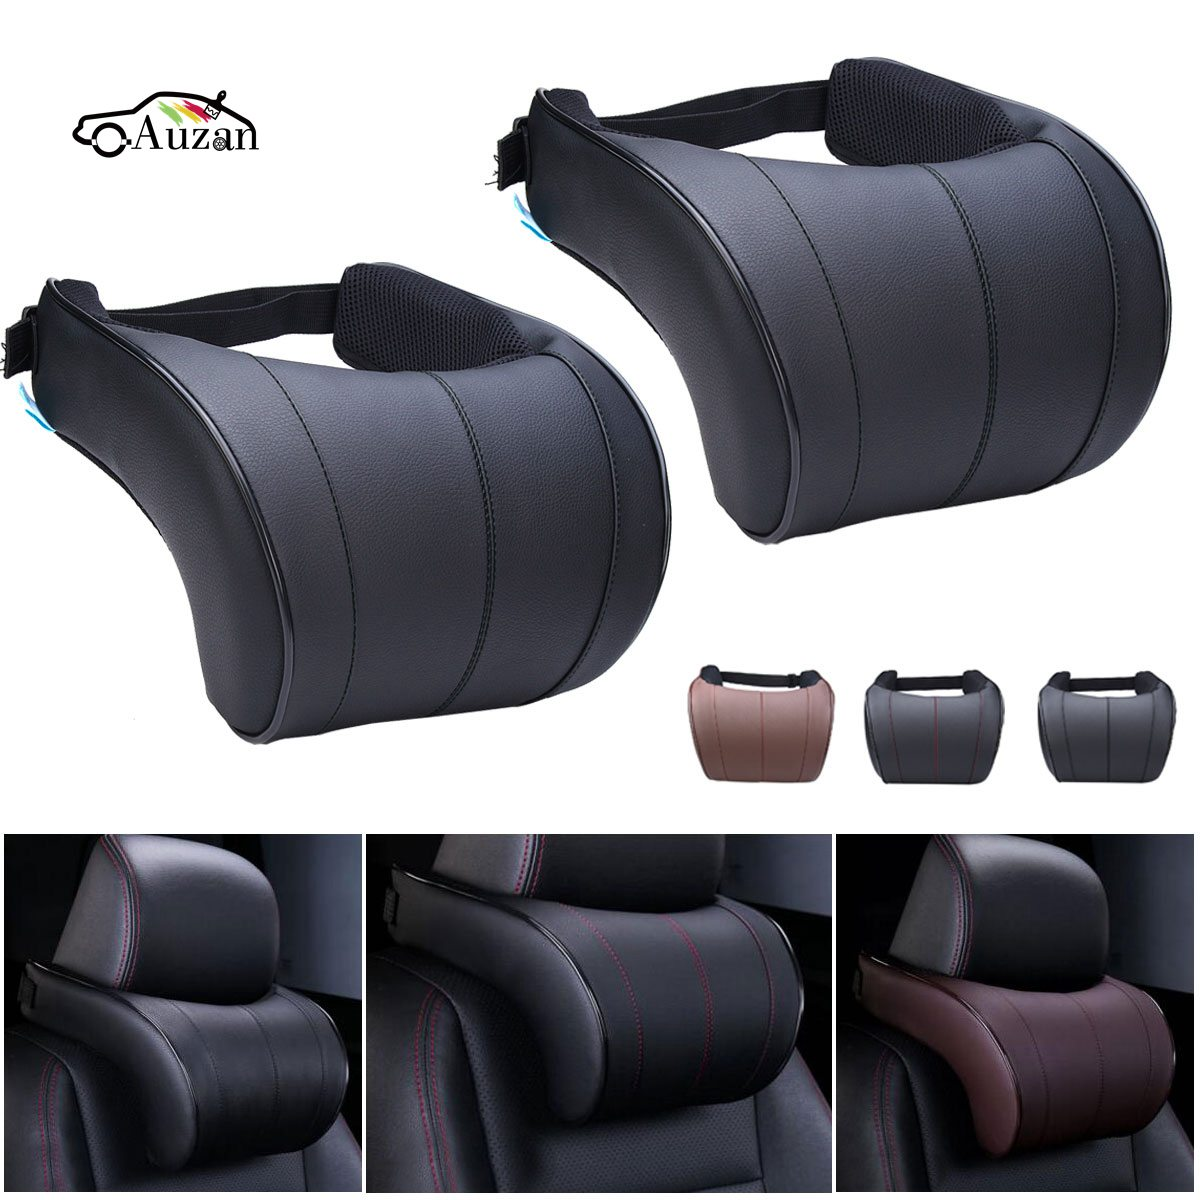 1pcs pu leather auto car neck pillow memory foam pillows neck rest seat headrest cushion pad